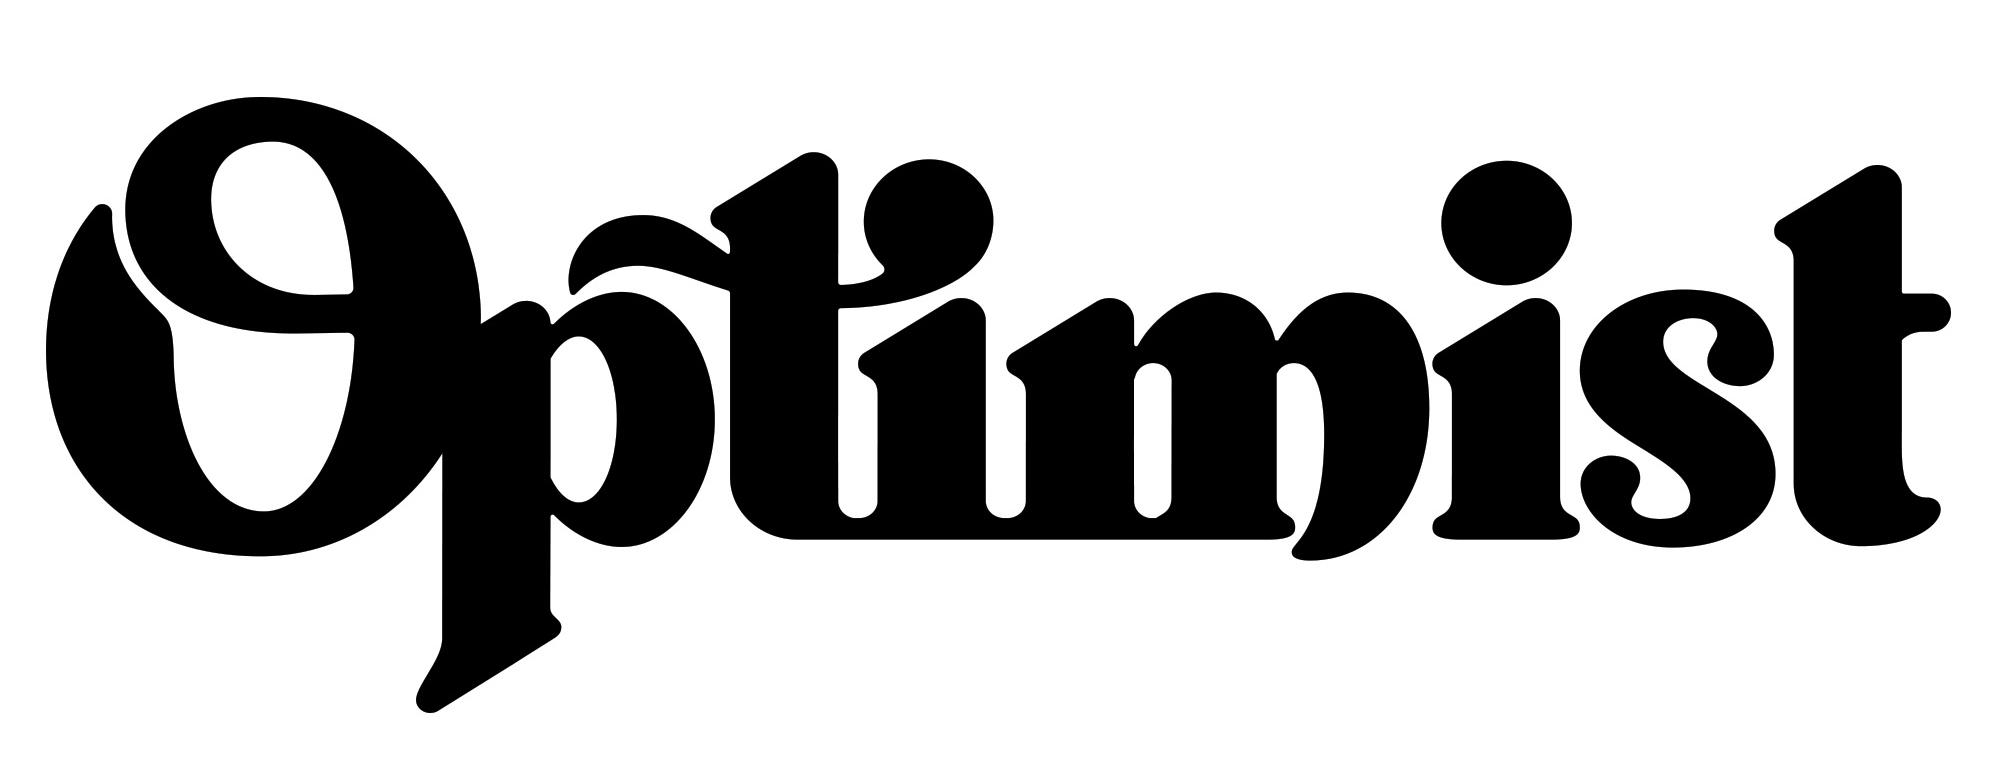 Optimist  - Film, Letterpress Prints